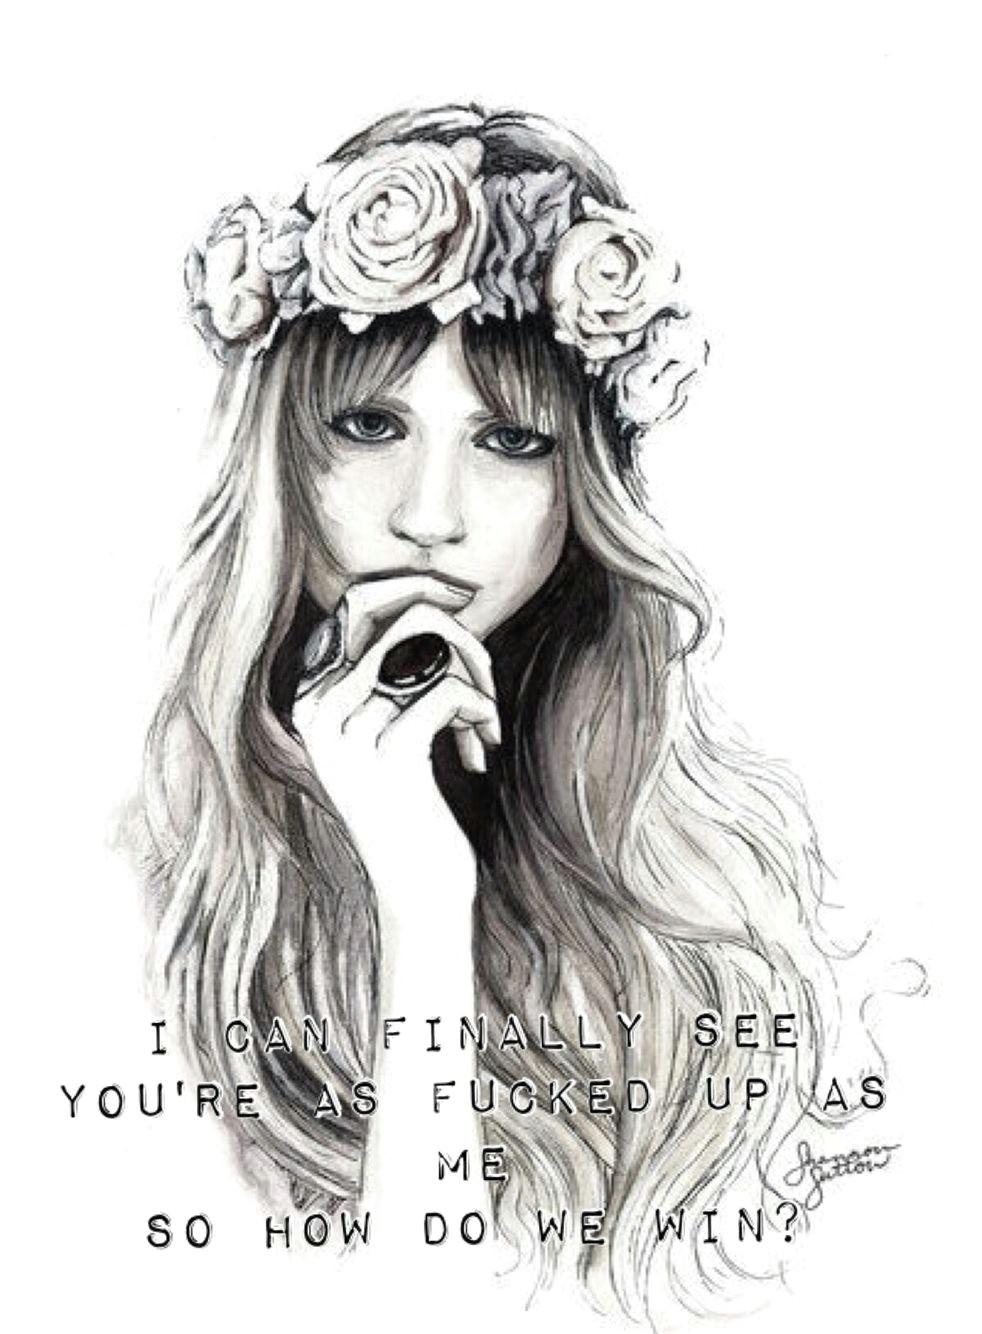 dodie clark sick of losing soulmates girl drawings tumblr drawings pencil drawings